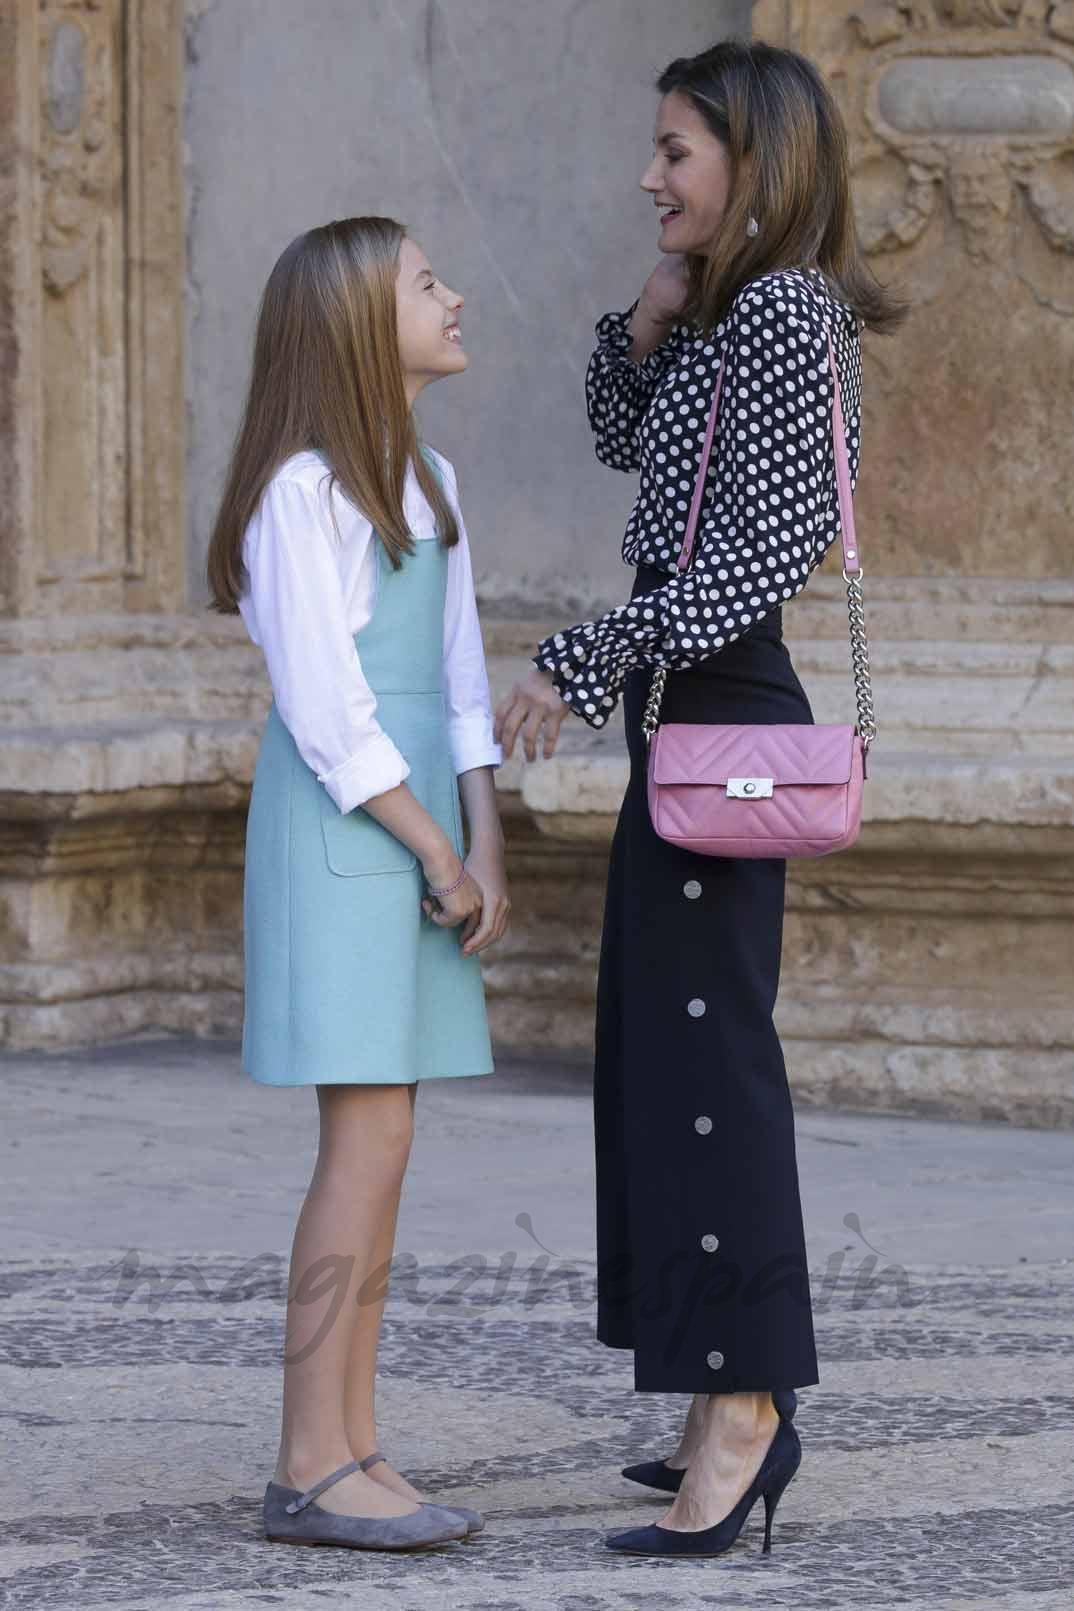 La Reina Letizia con la infanta Sofía